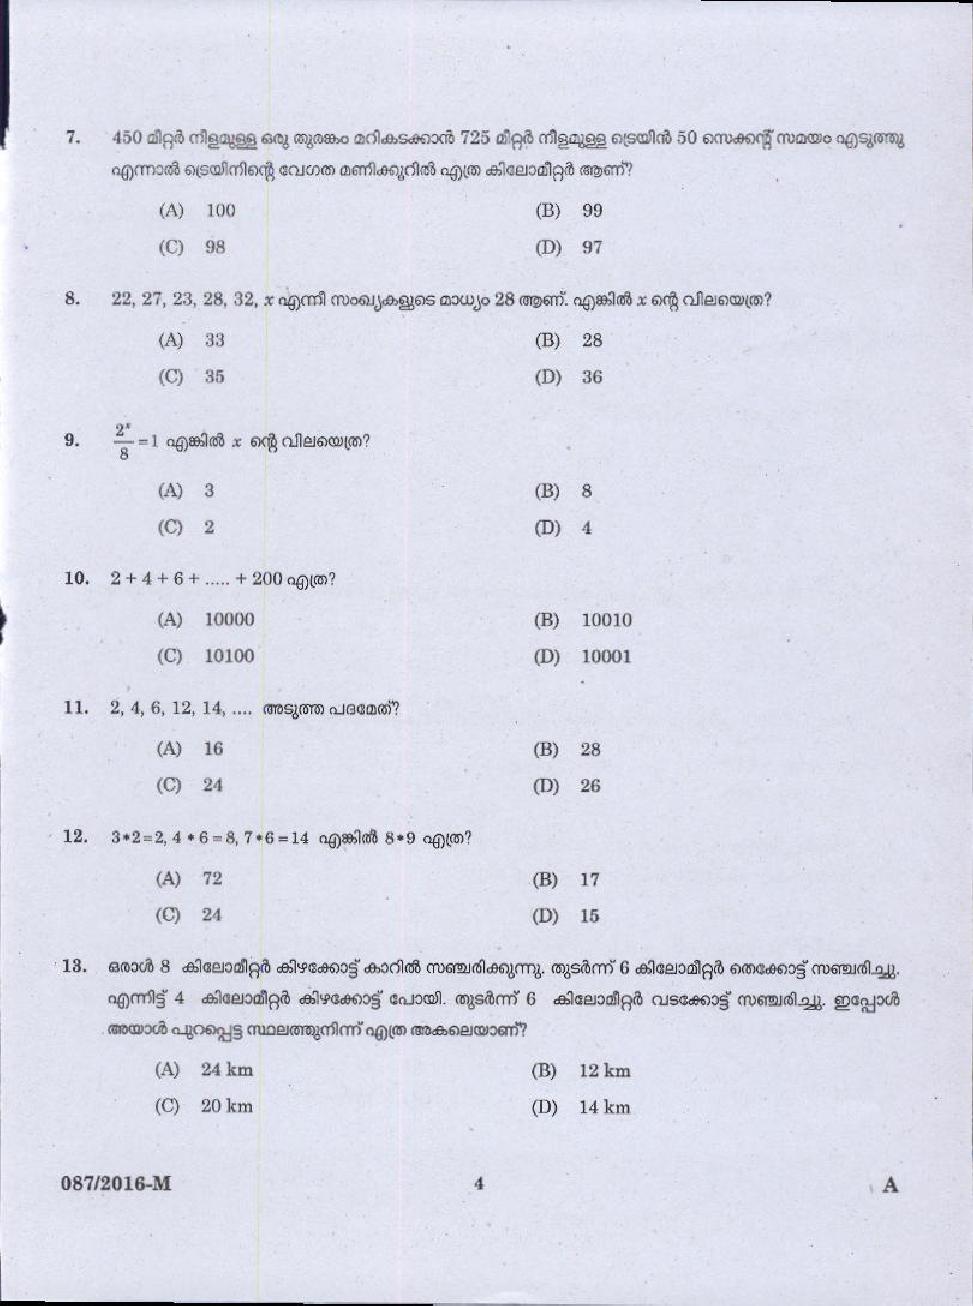 http://masterstudy.net//pdf/psc/village-extension-officer-gr-ii-rural-development/q_0872016-m0002.jpg